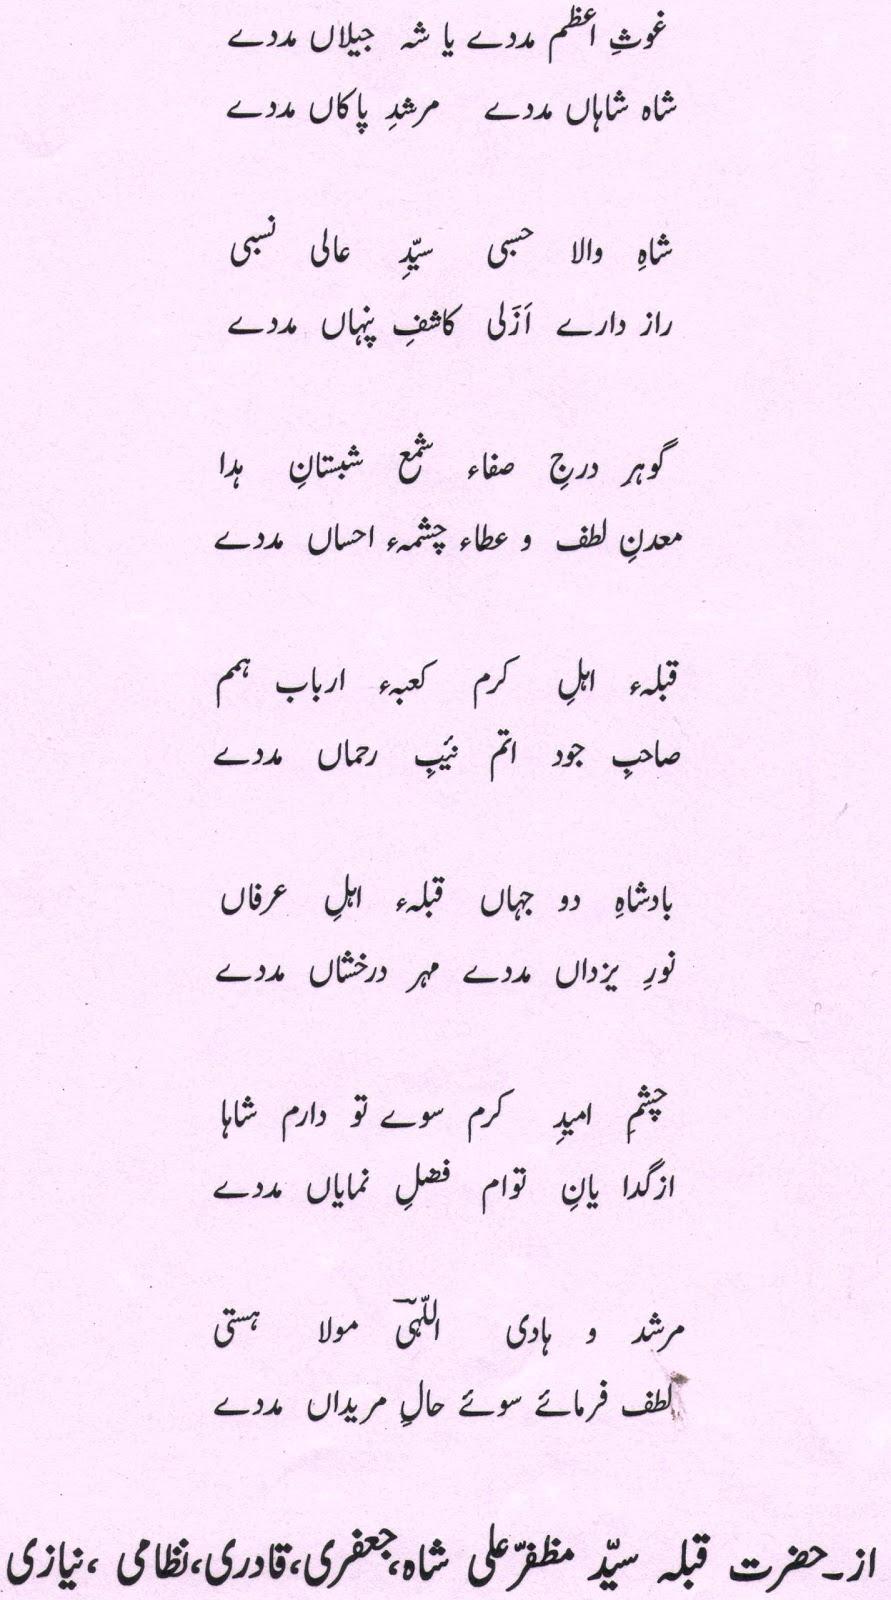 Lyrics of ya ali